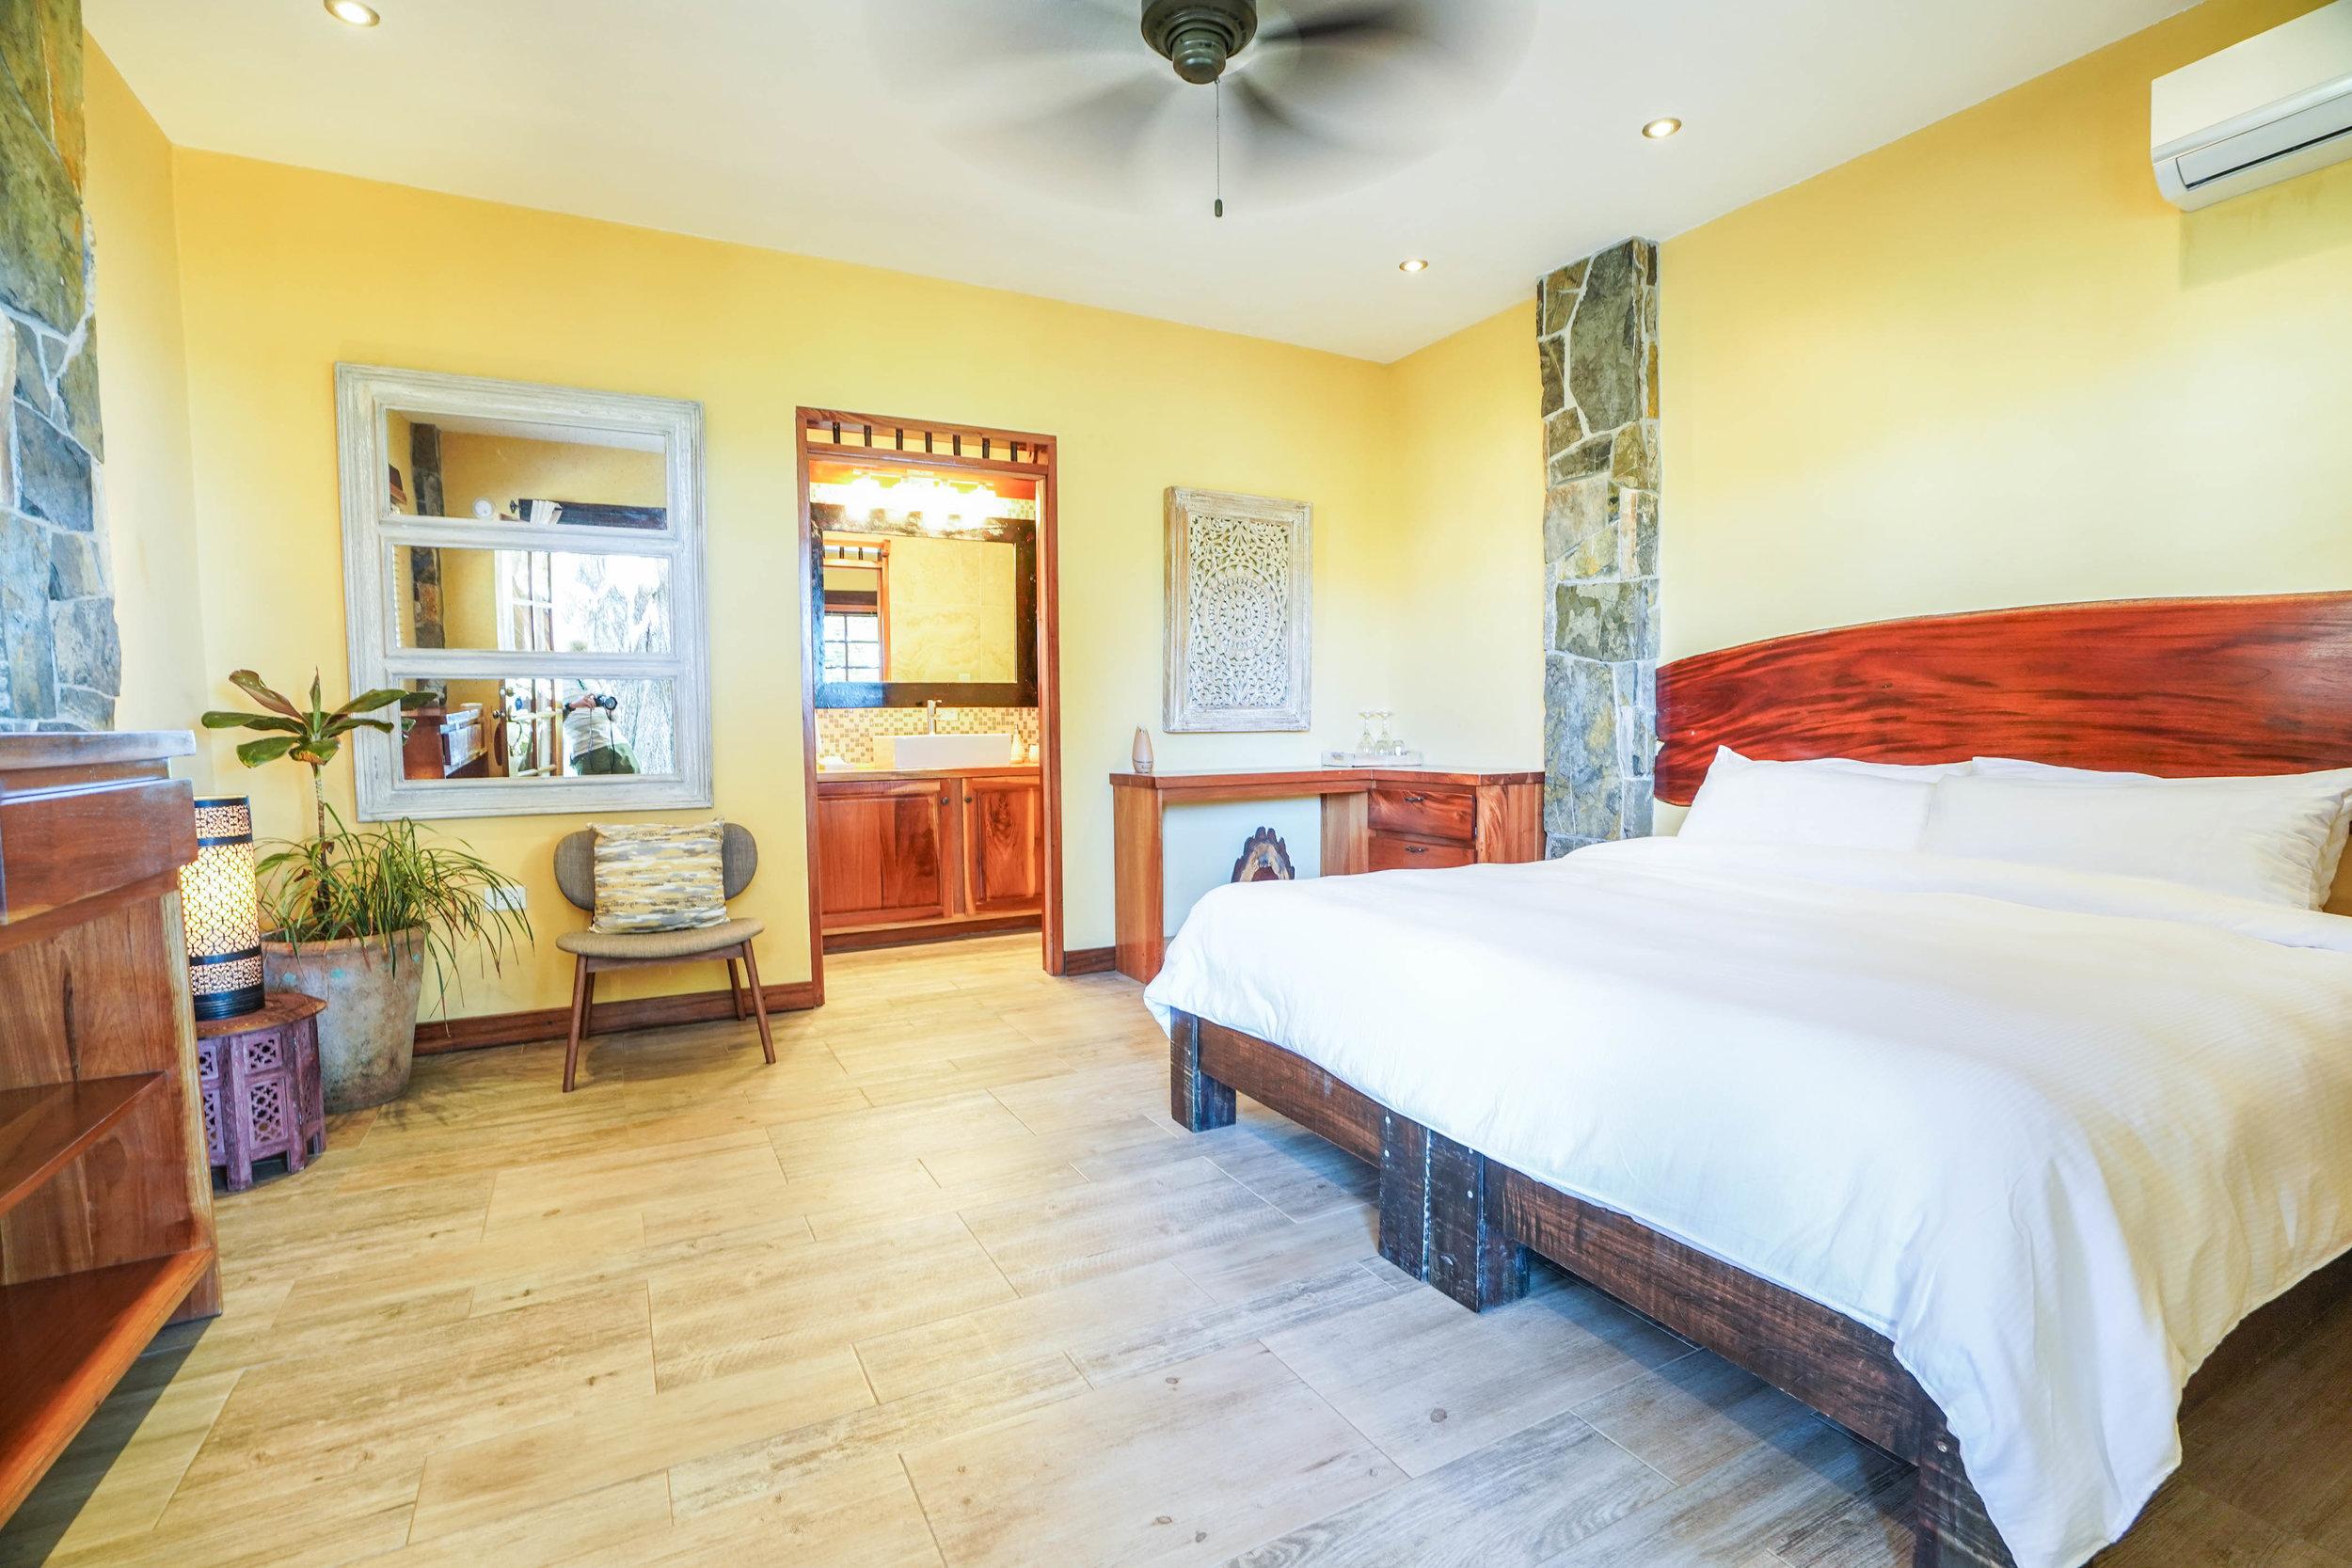 Sansara_Resort_Cabana_LaMarea_Lowres.jpg